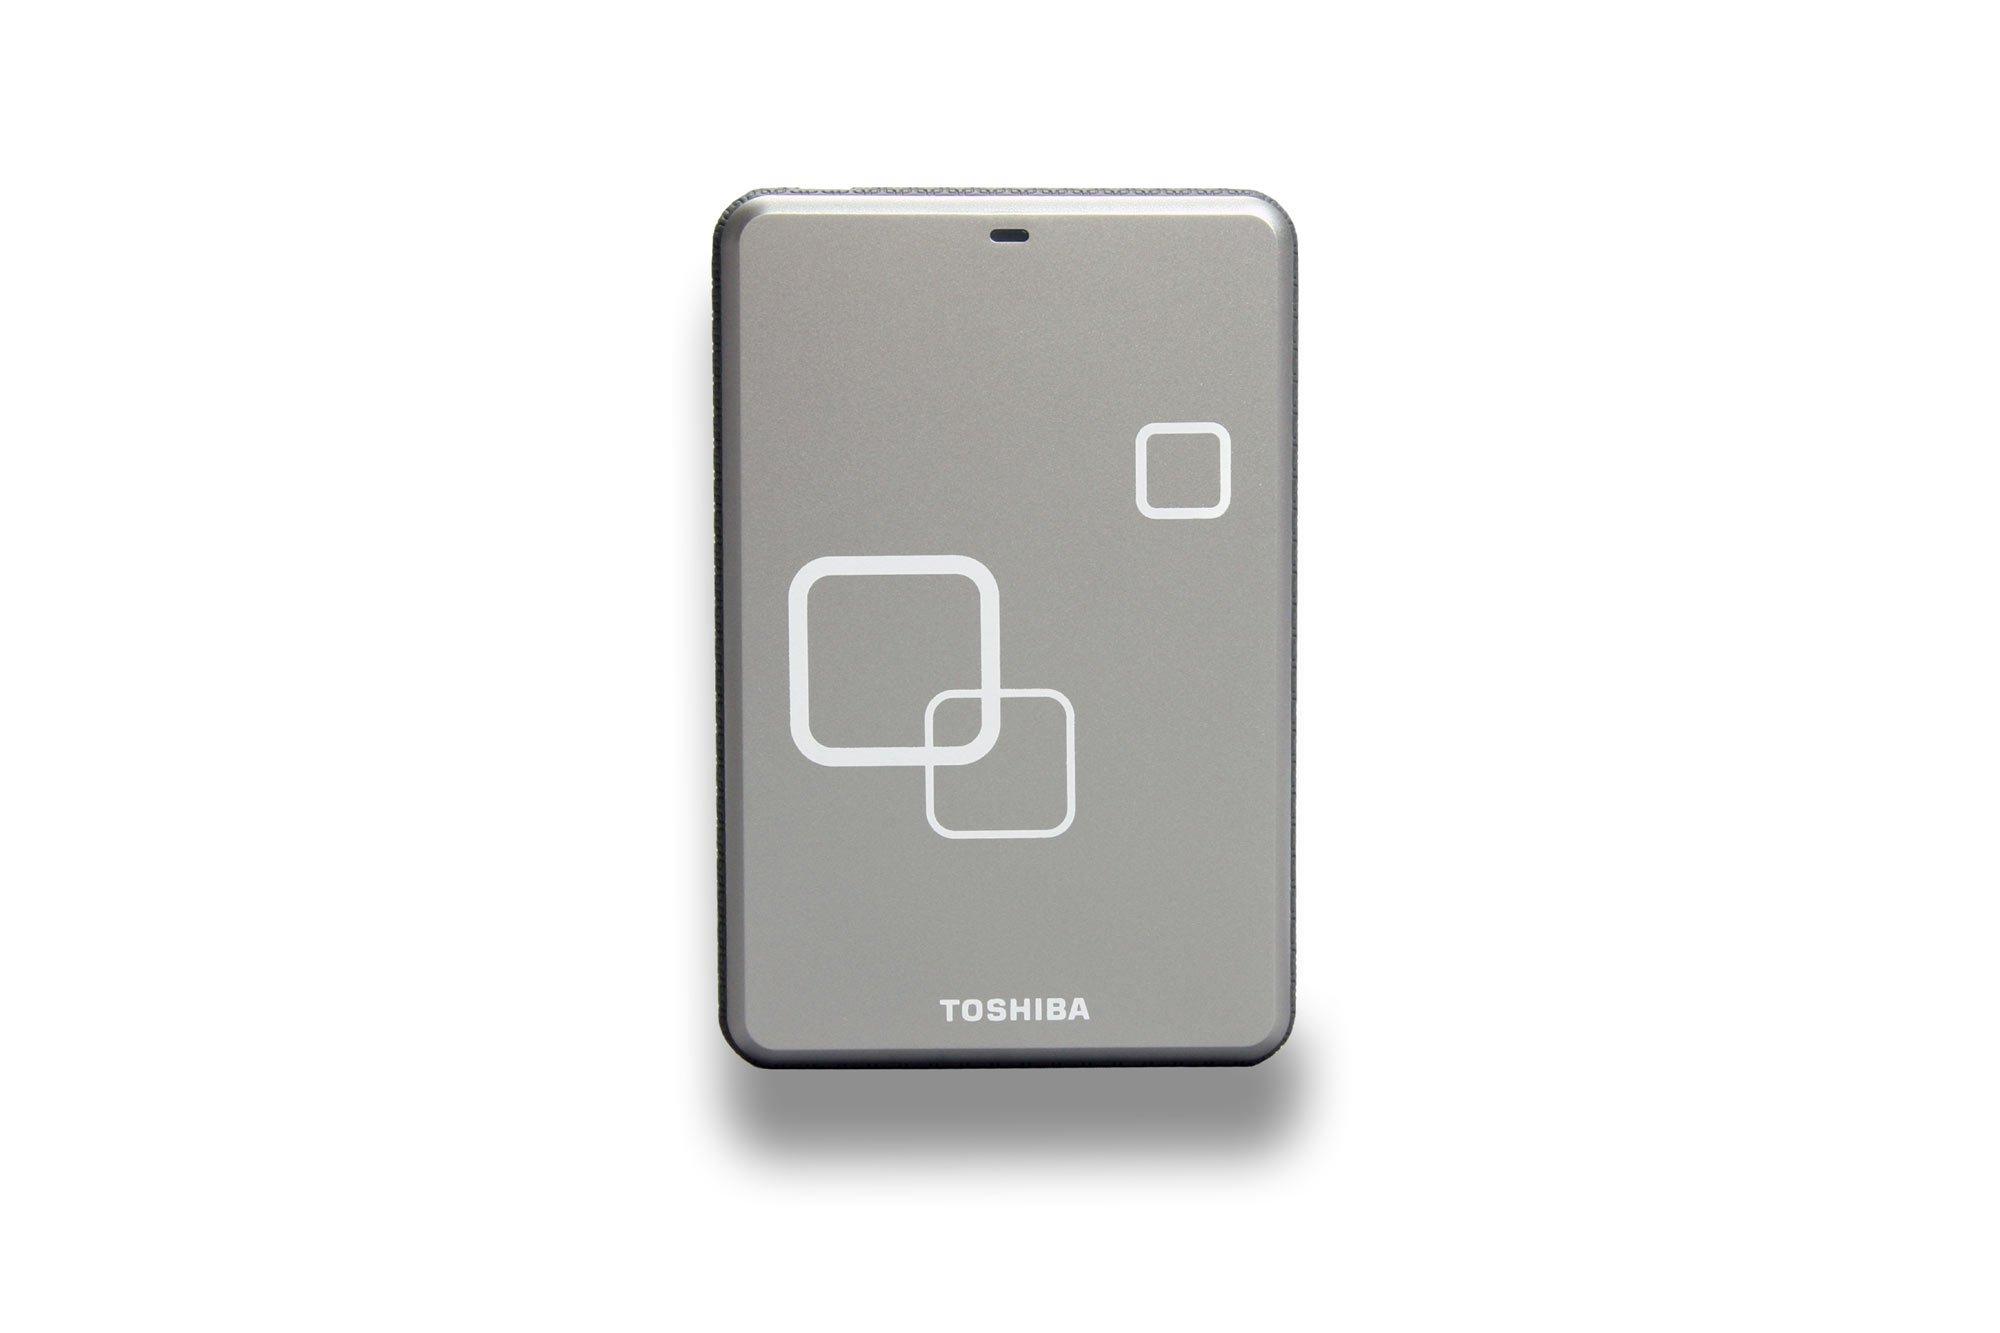 Toshiba Canvio Disco Duro Externo portátil USB 2.0 para Mac Plata ...